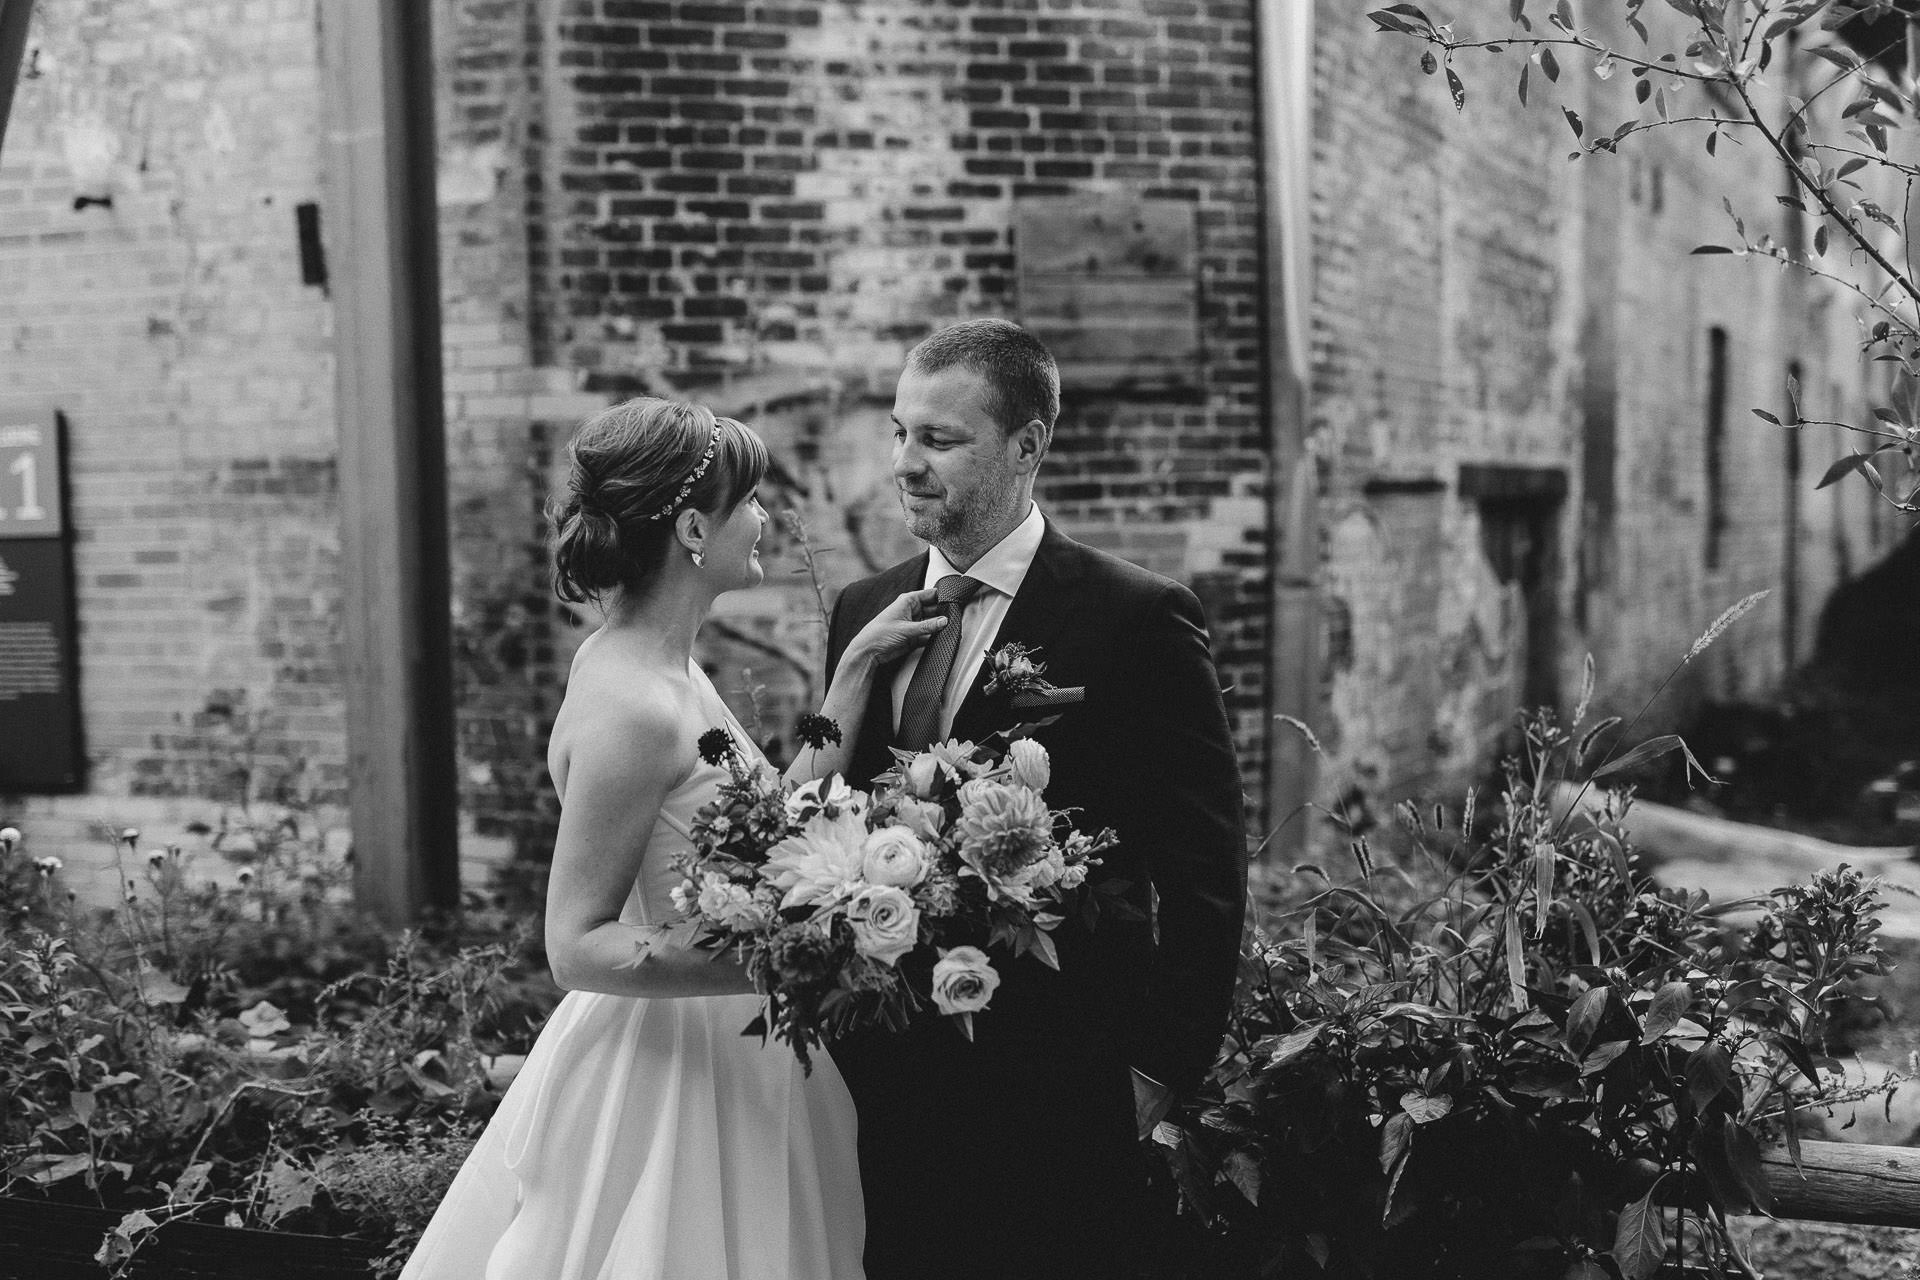 Evergreen Brickworks wedding photographer - bride fixing the grooms tie